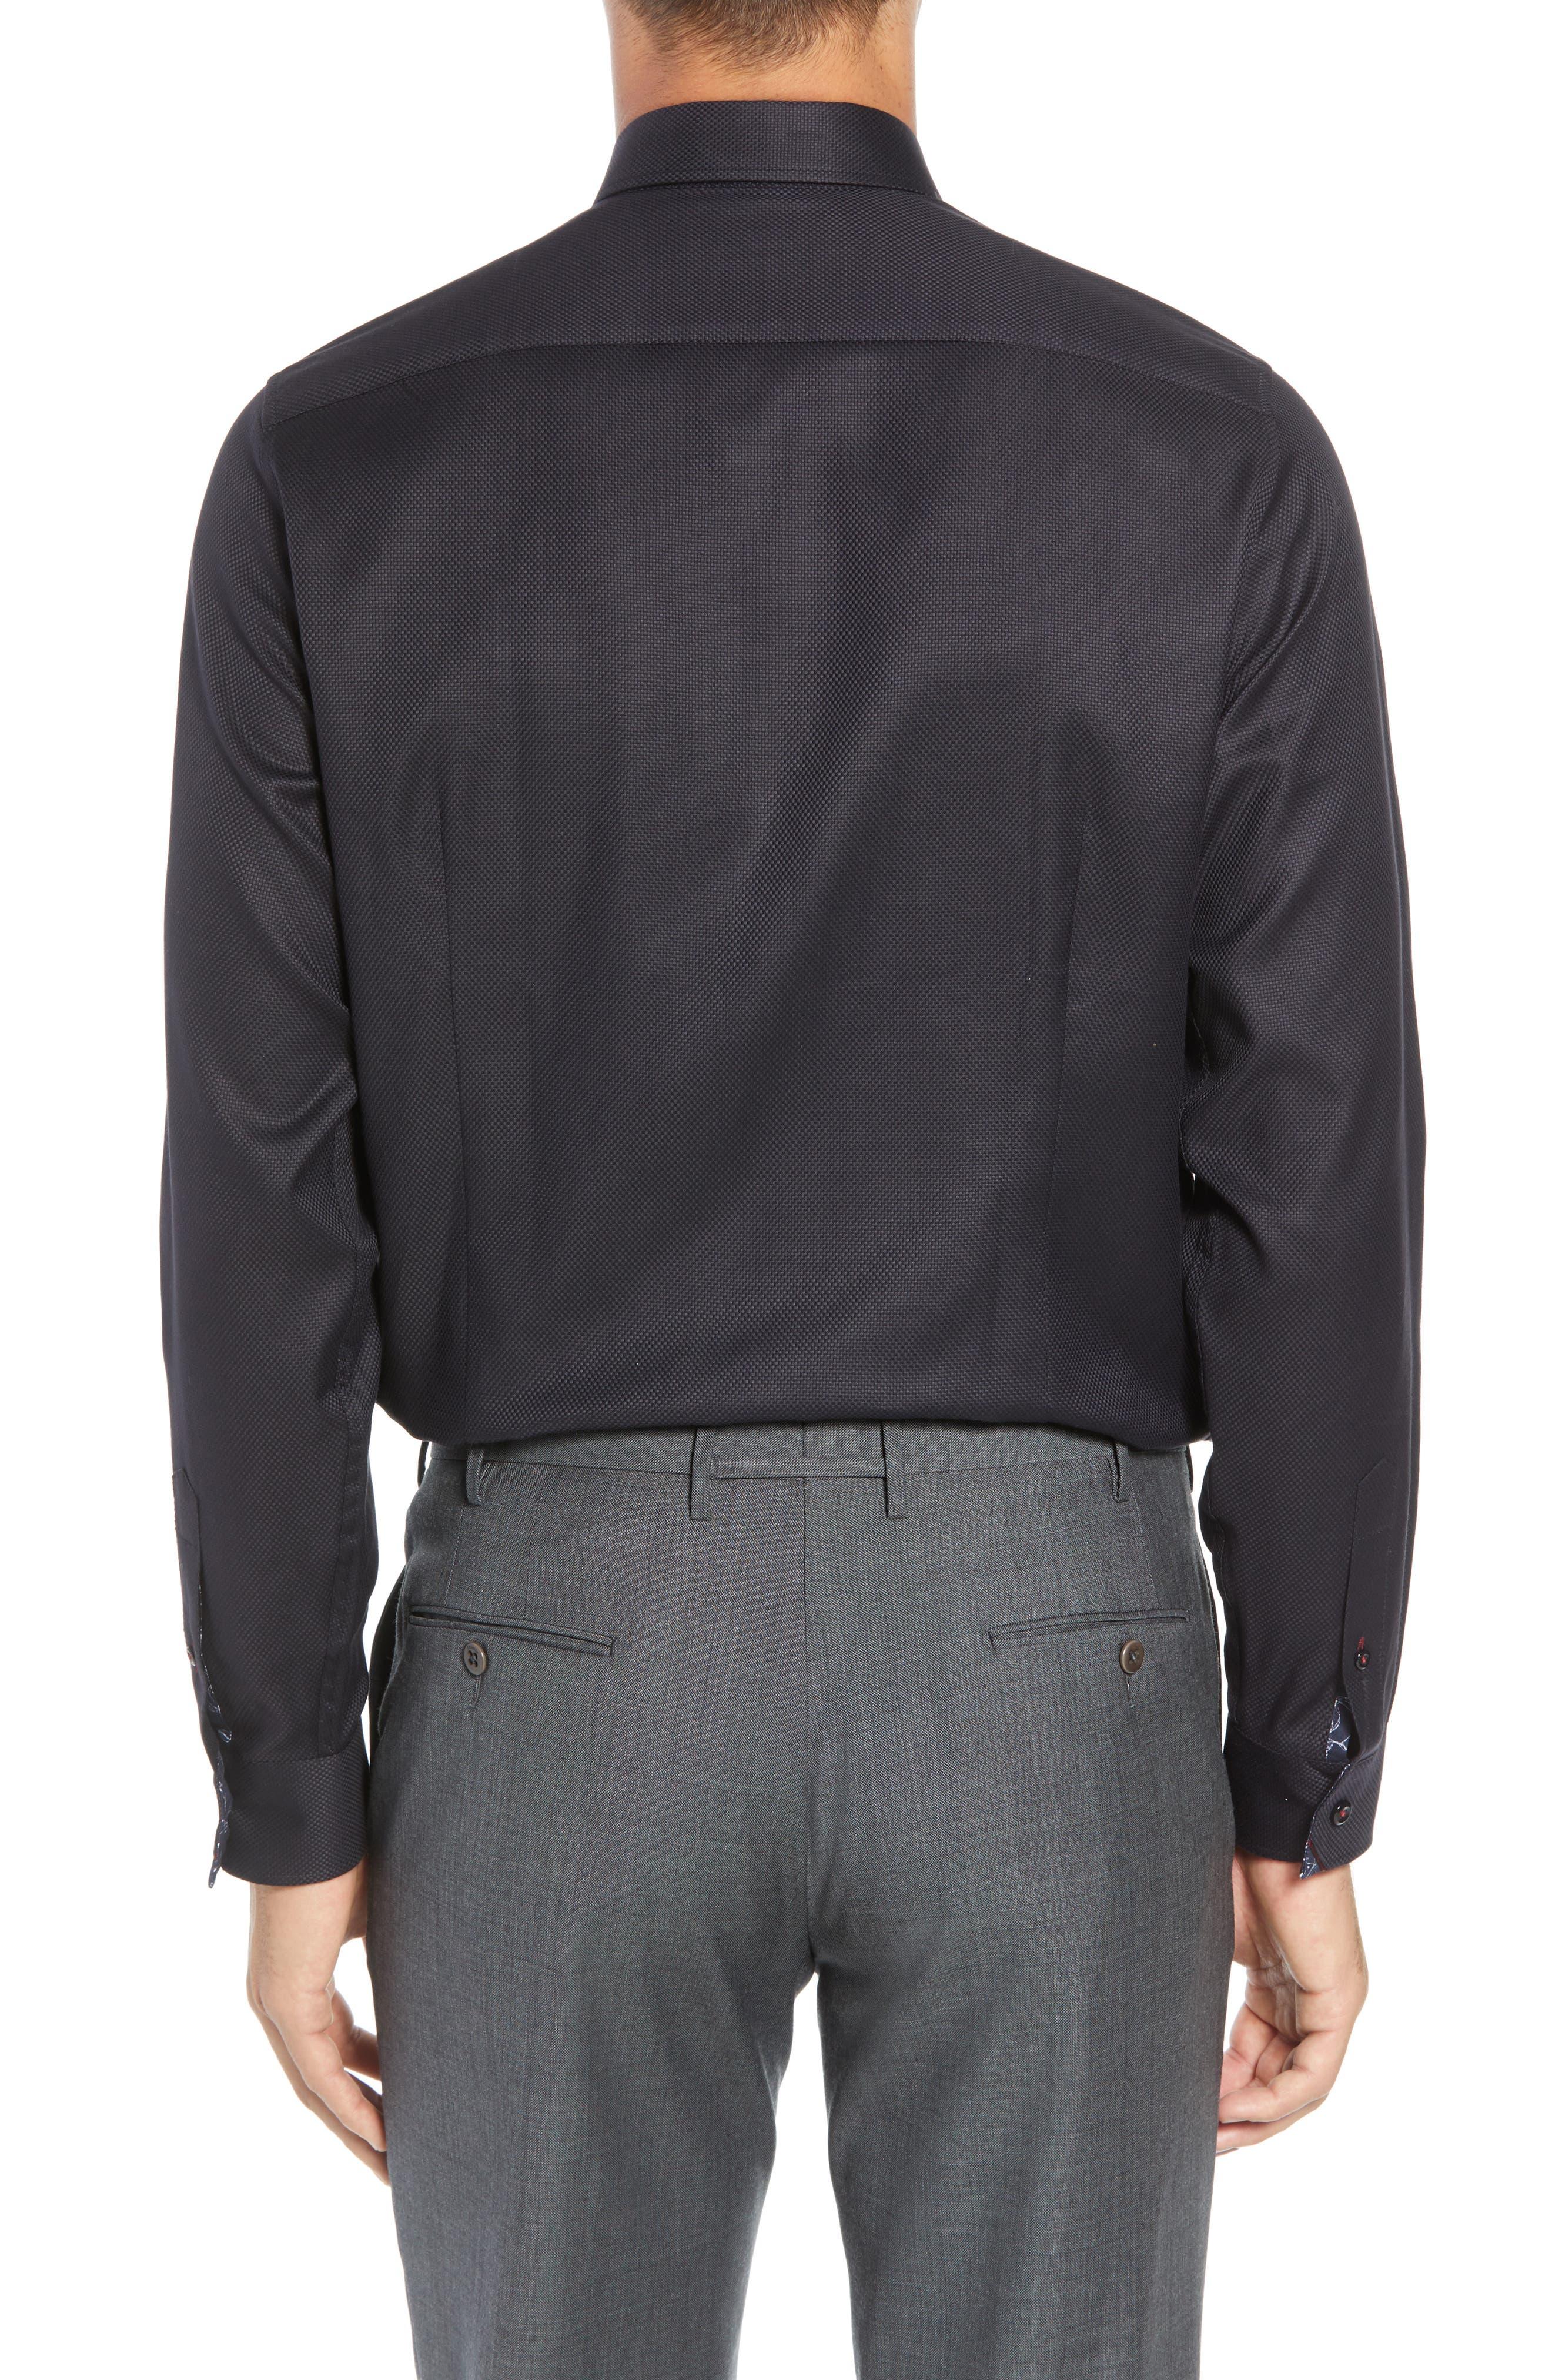 Leek Slim Fit Solid Dress Shirt,                             Alternate thumbnail 3, color,                             NAVY